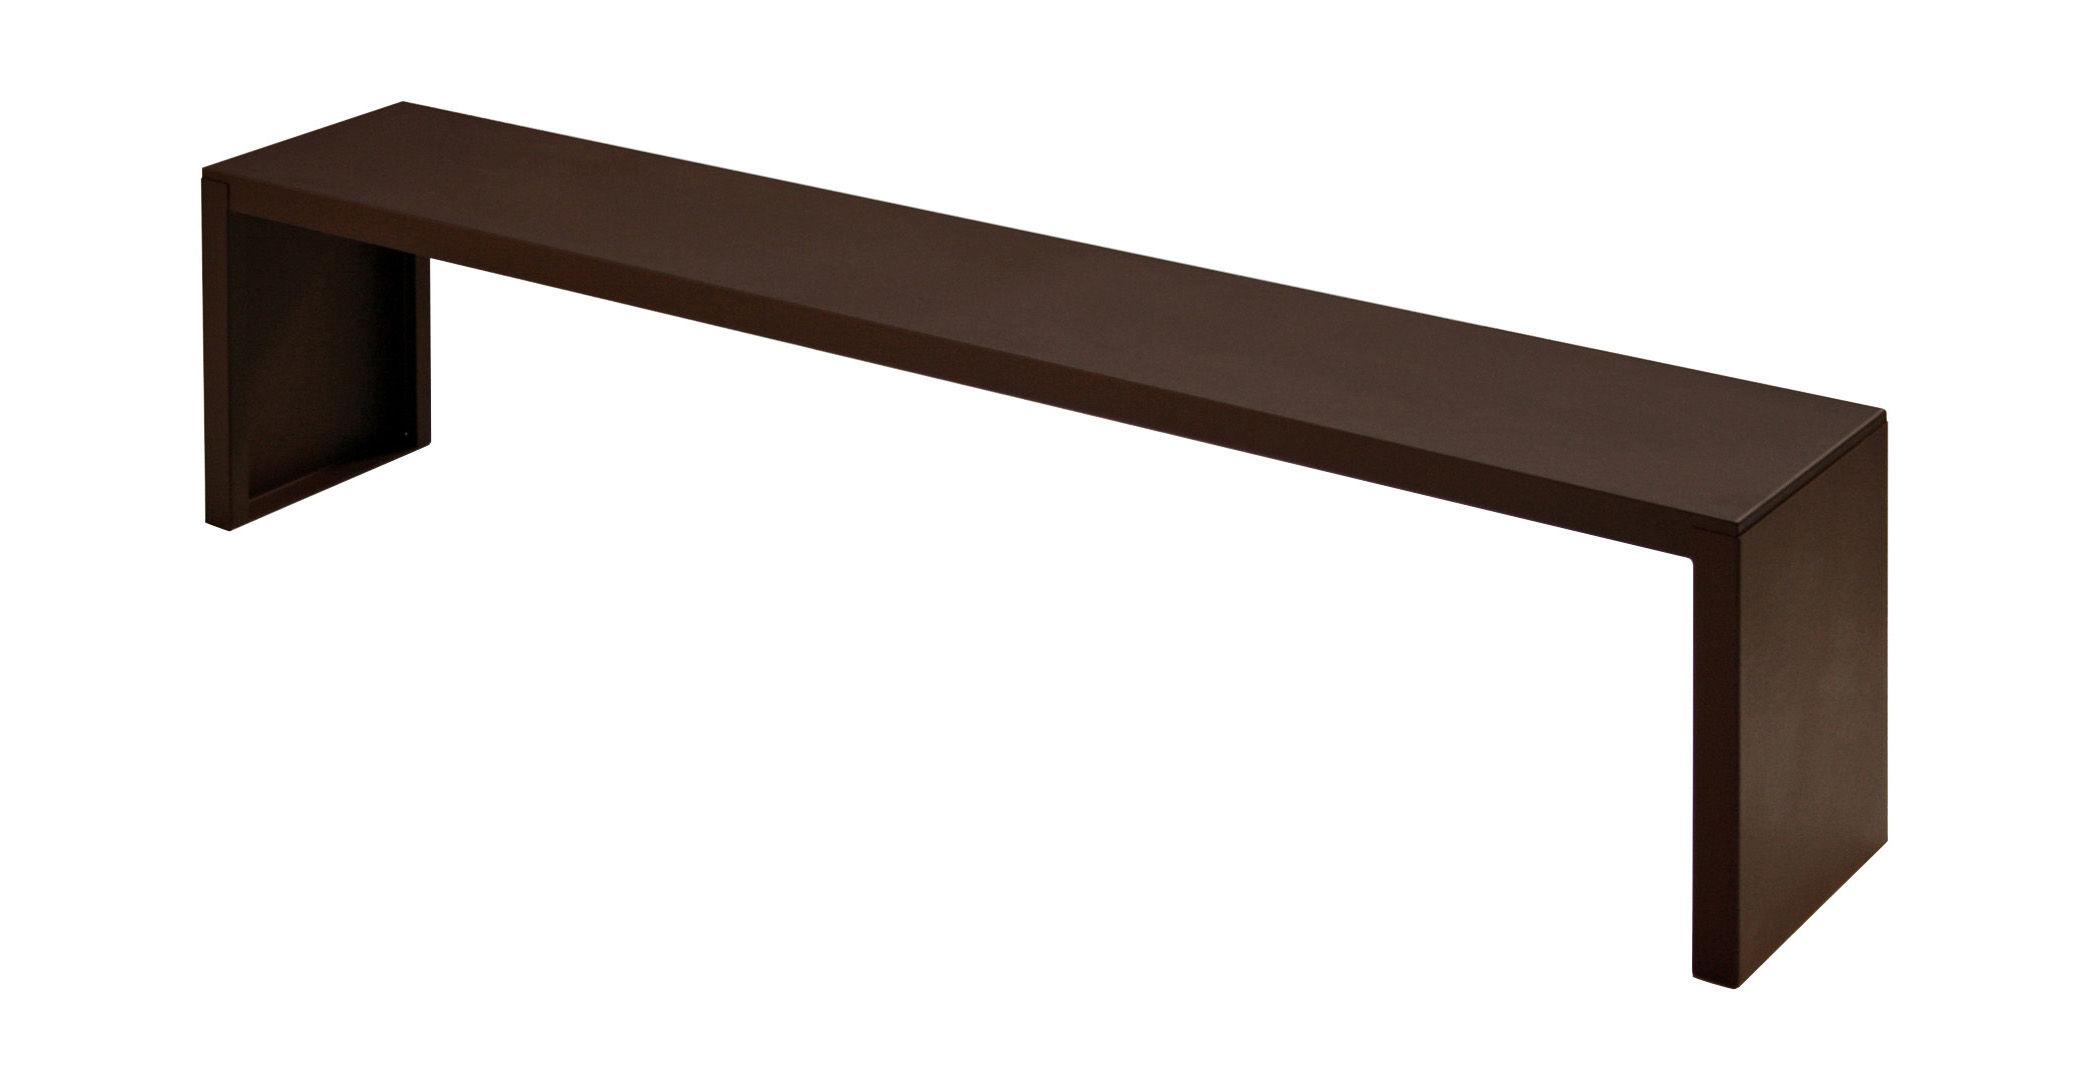 banc rusty irony l 130 cm m tal rouille l 130 cm zeus. Black Bedroom Furniture Sets. Home Design Ideas